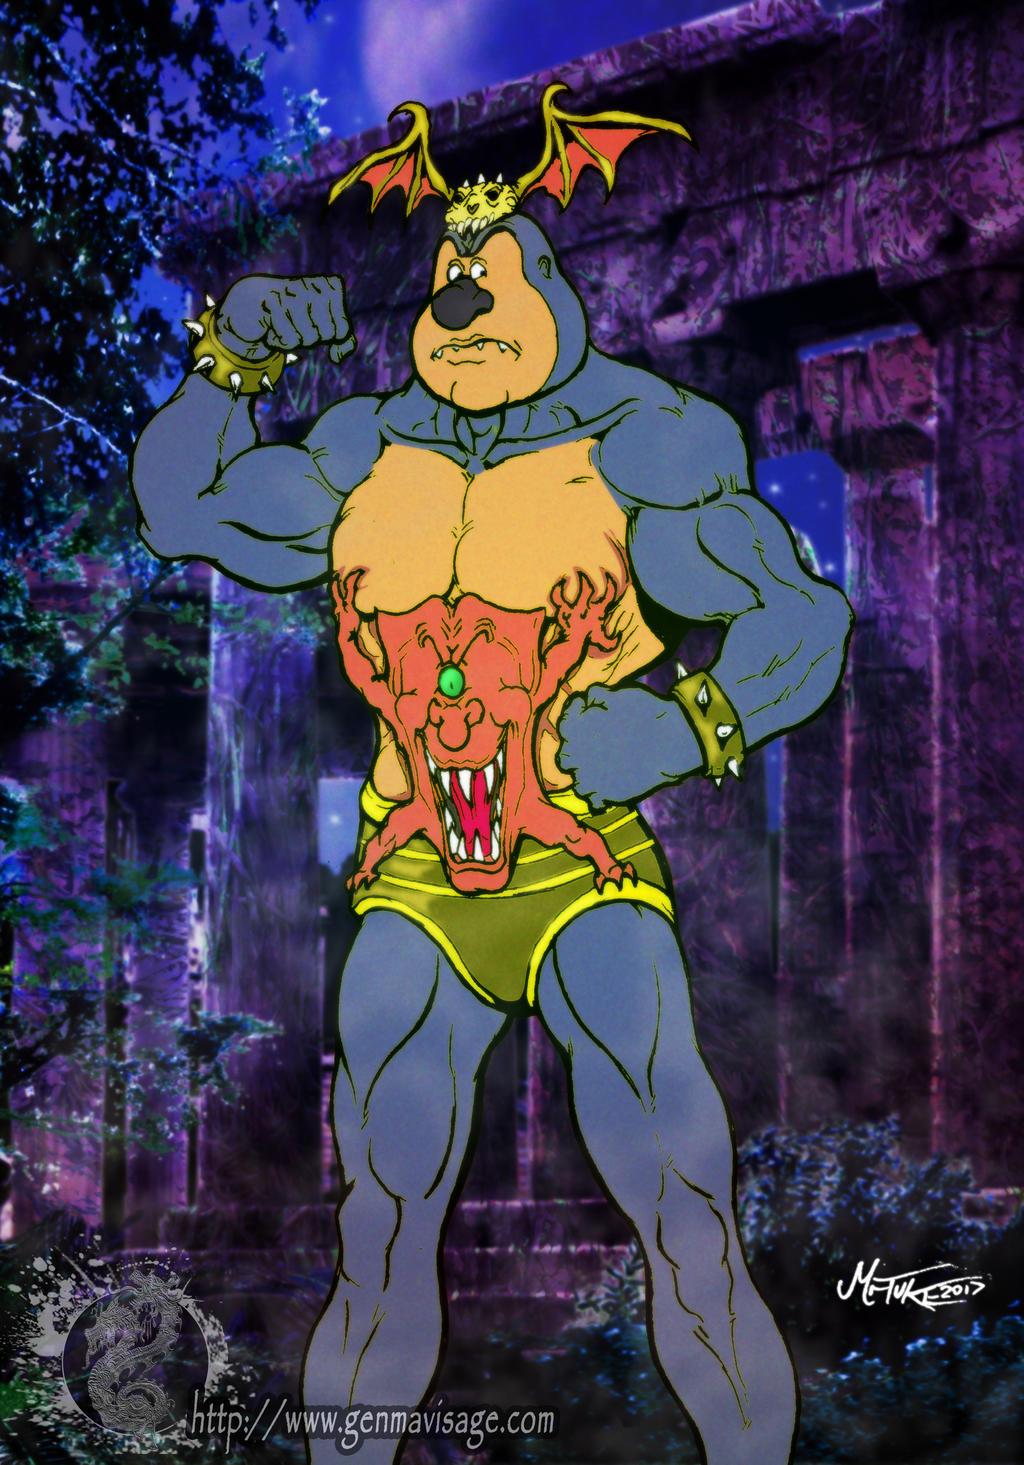 The Strongman by MrTuke